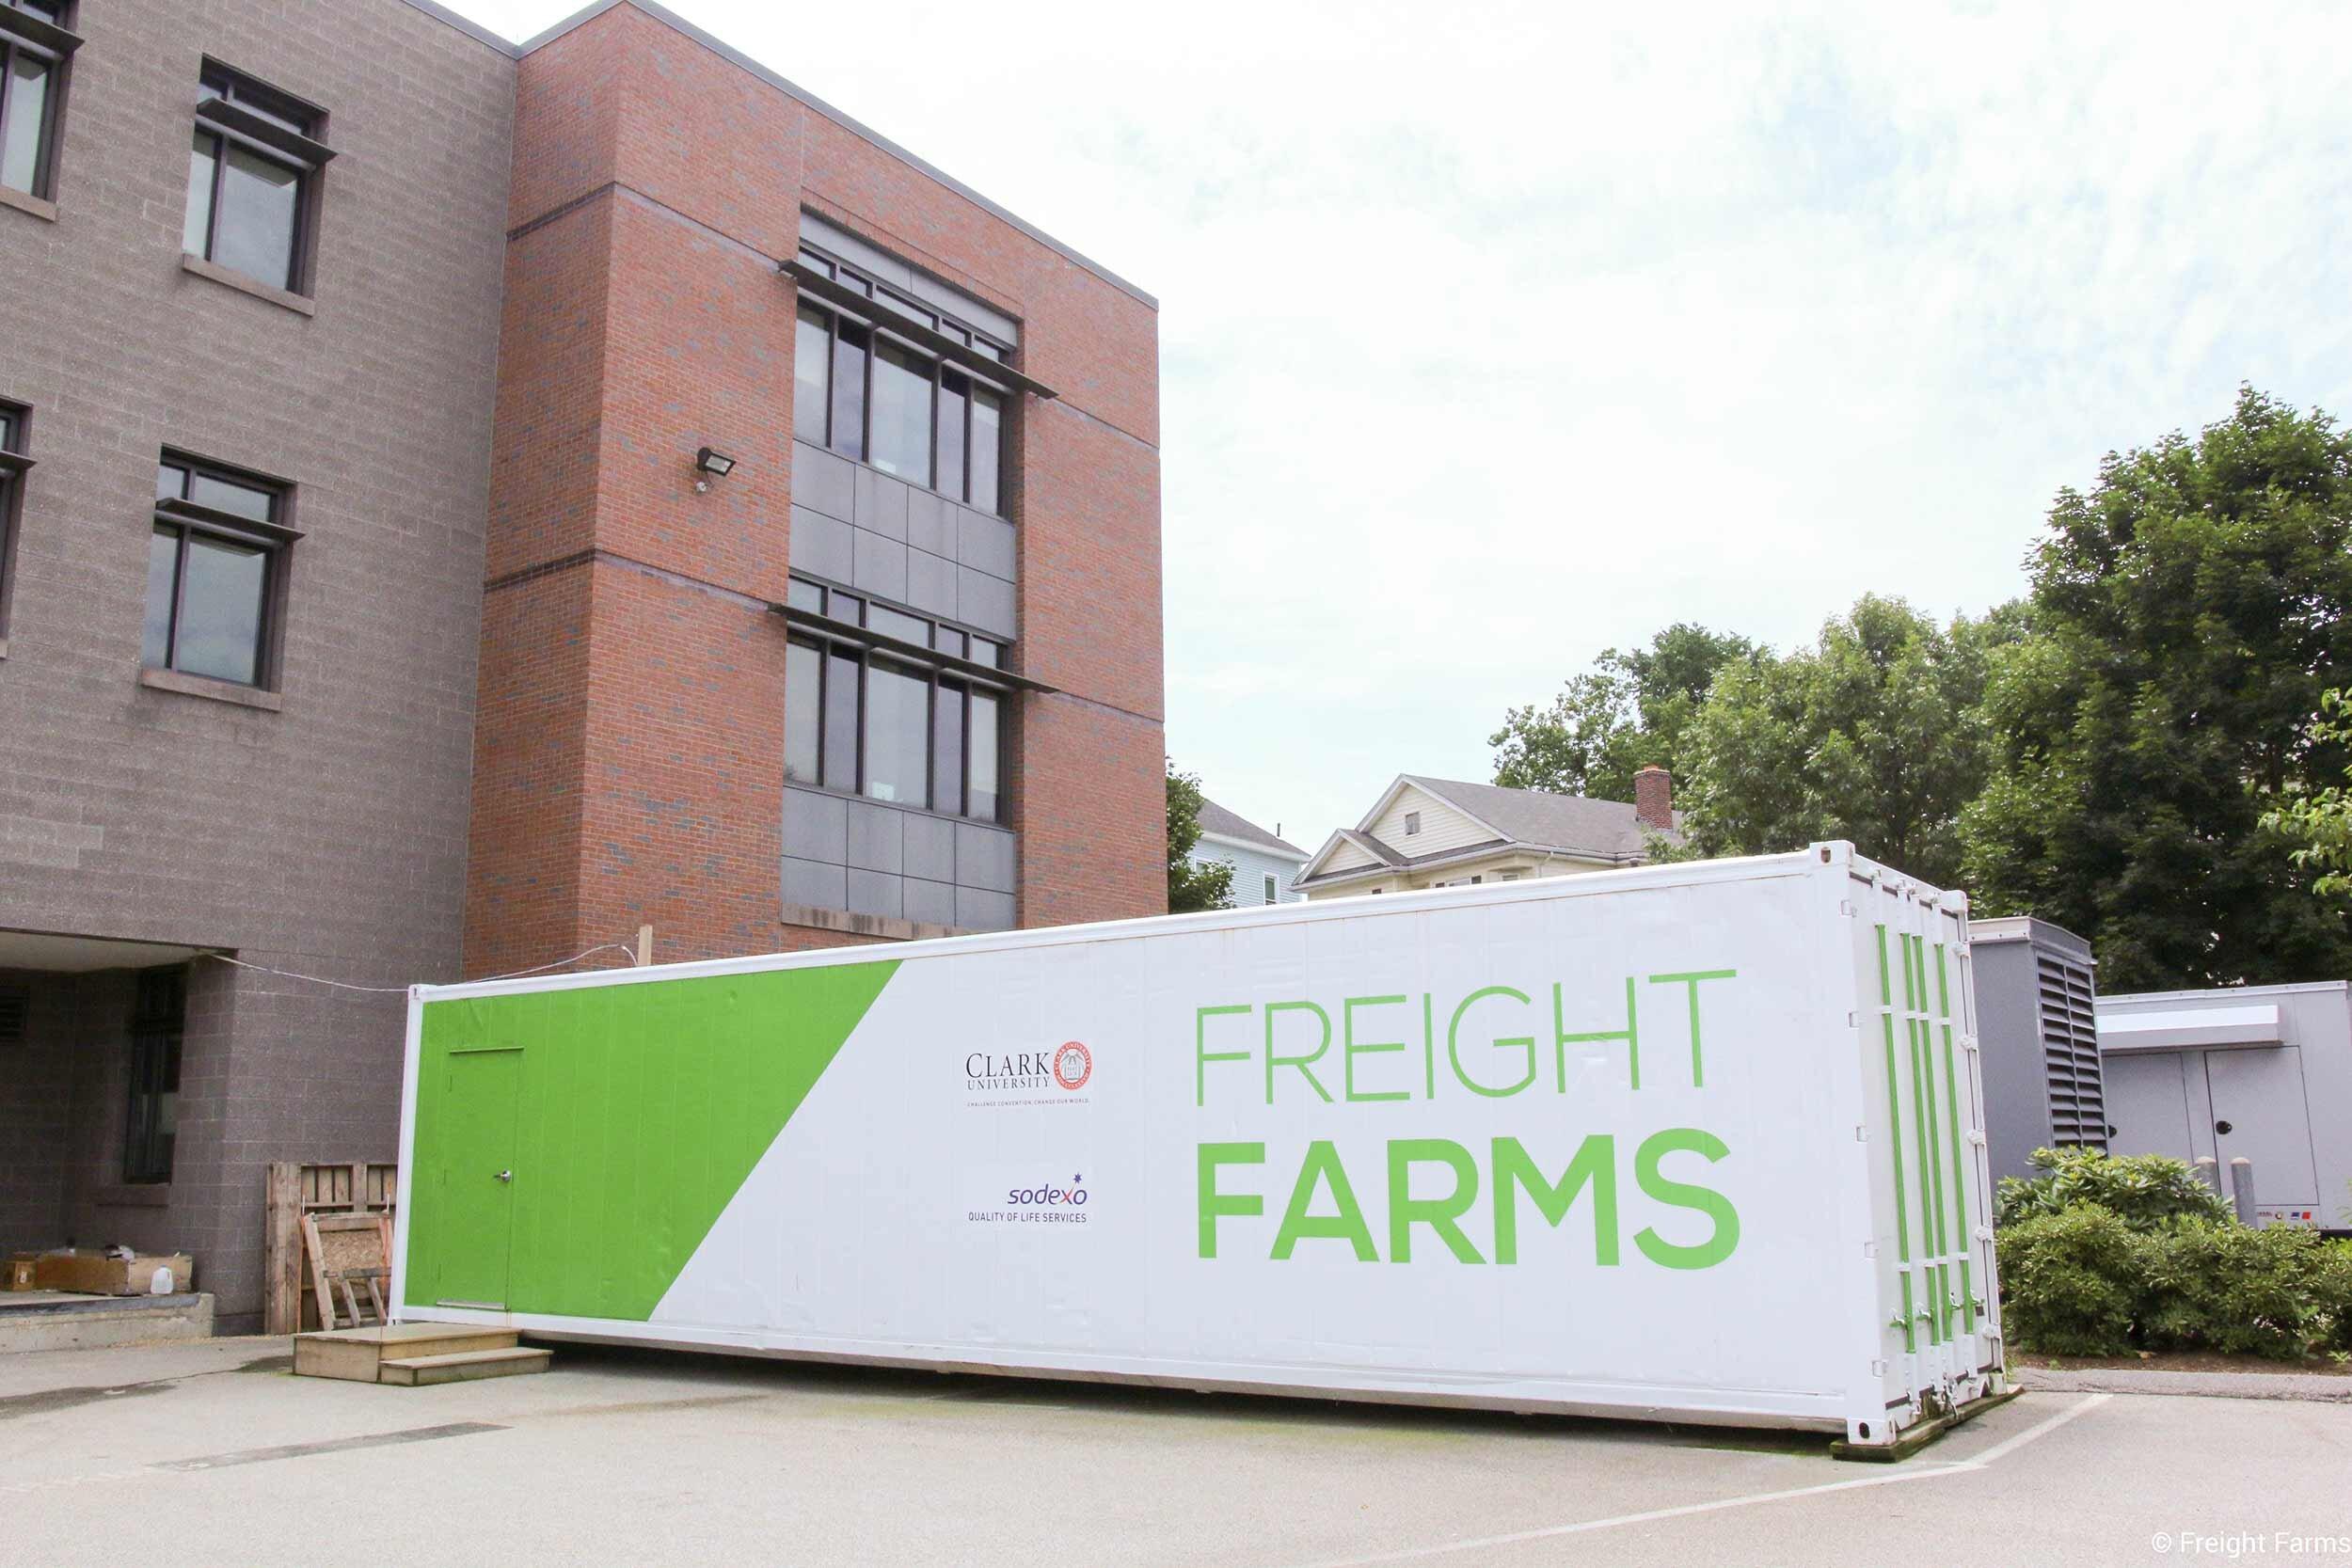 Freight Farms_Clark_Sodexo_Container_Farm.jpg